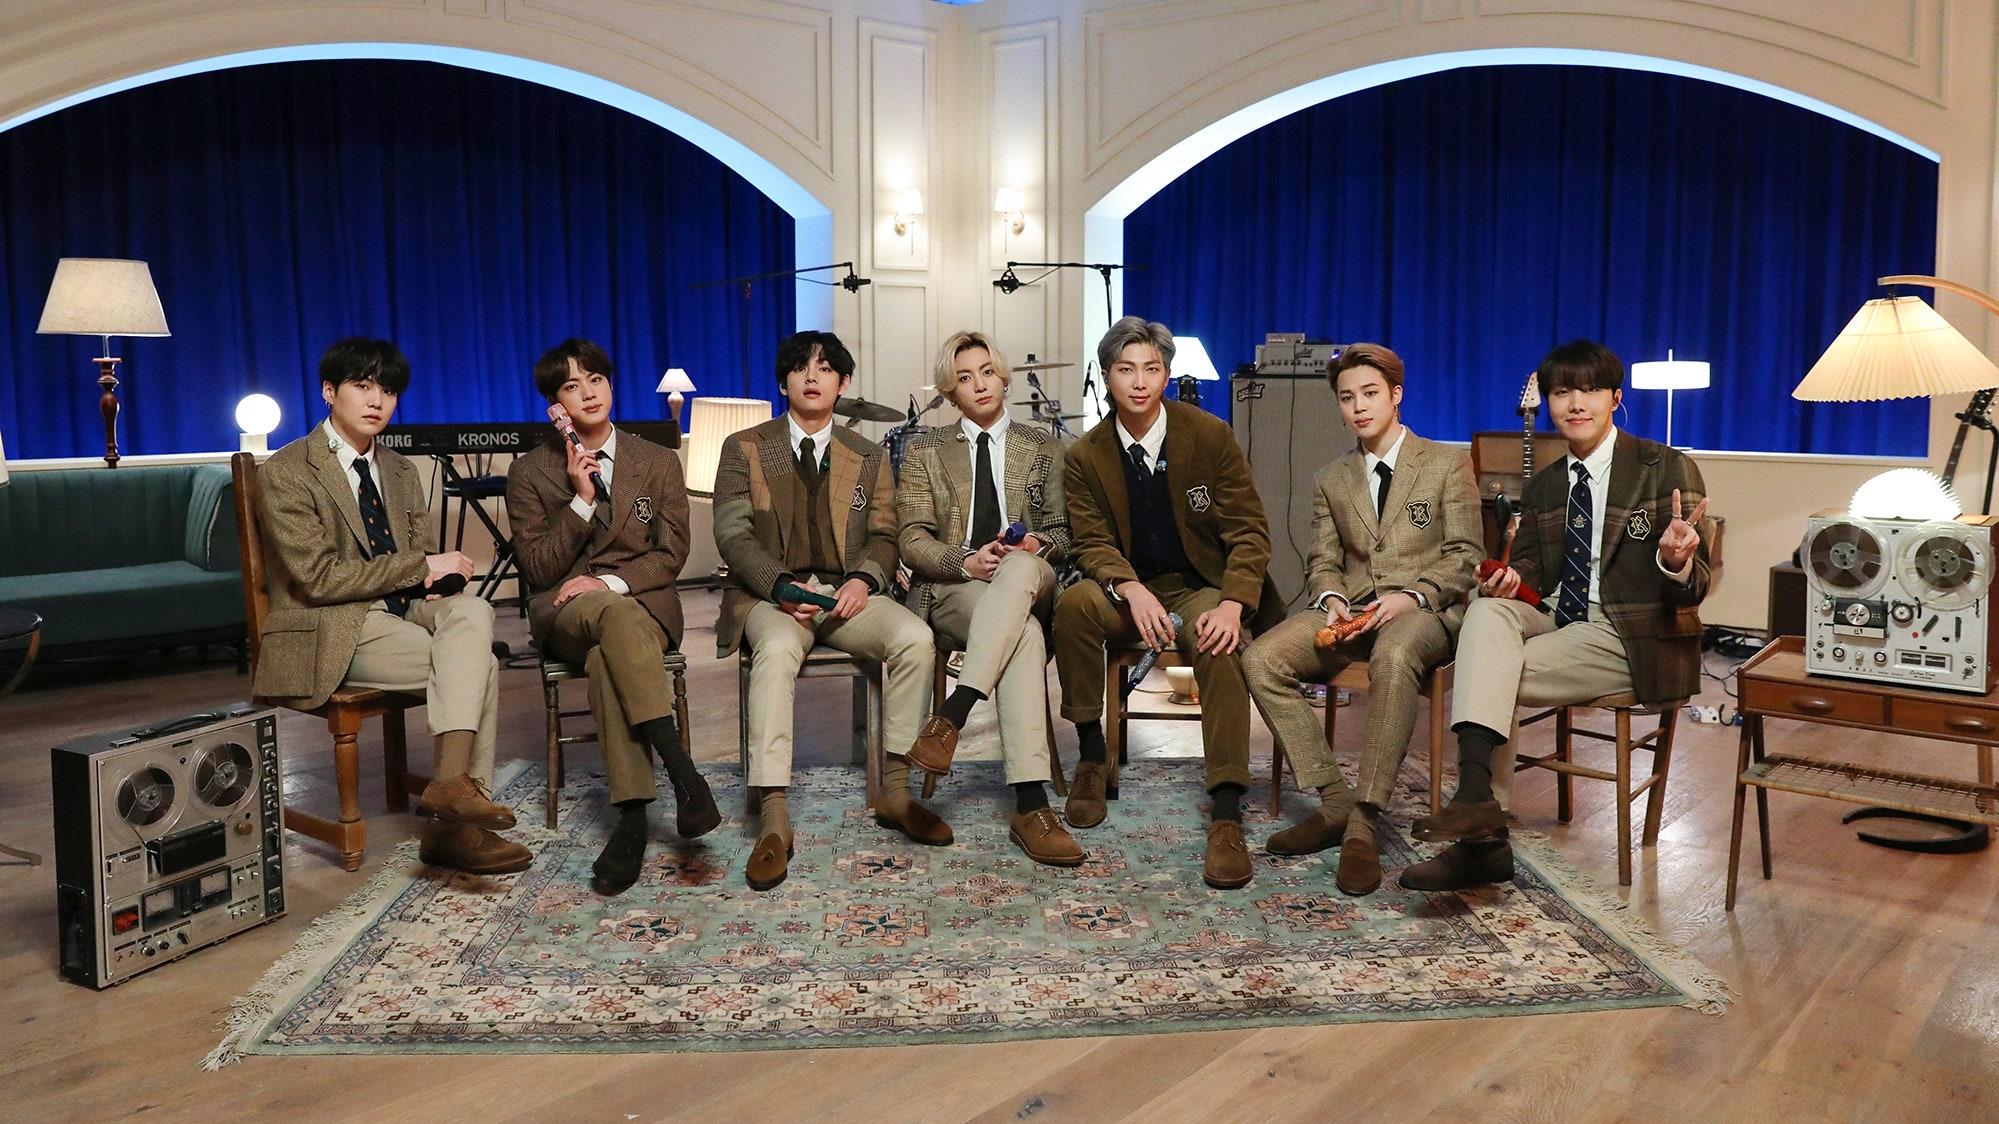 BTS on MTV's Unplugged